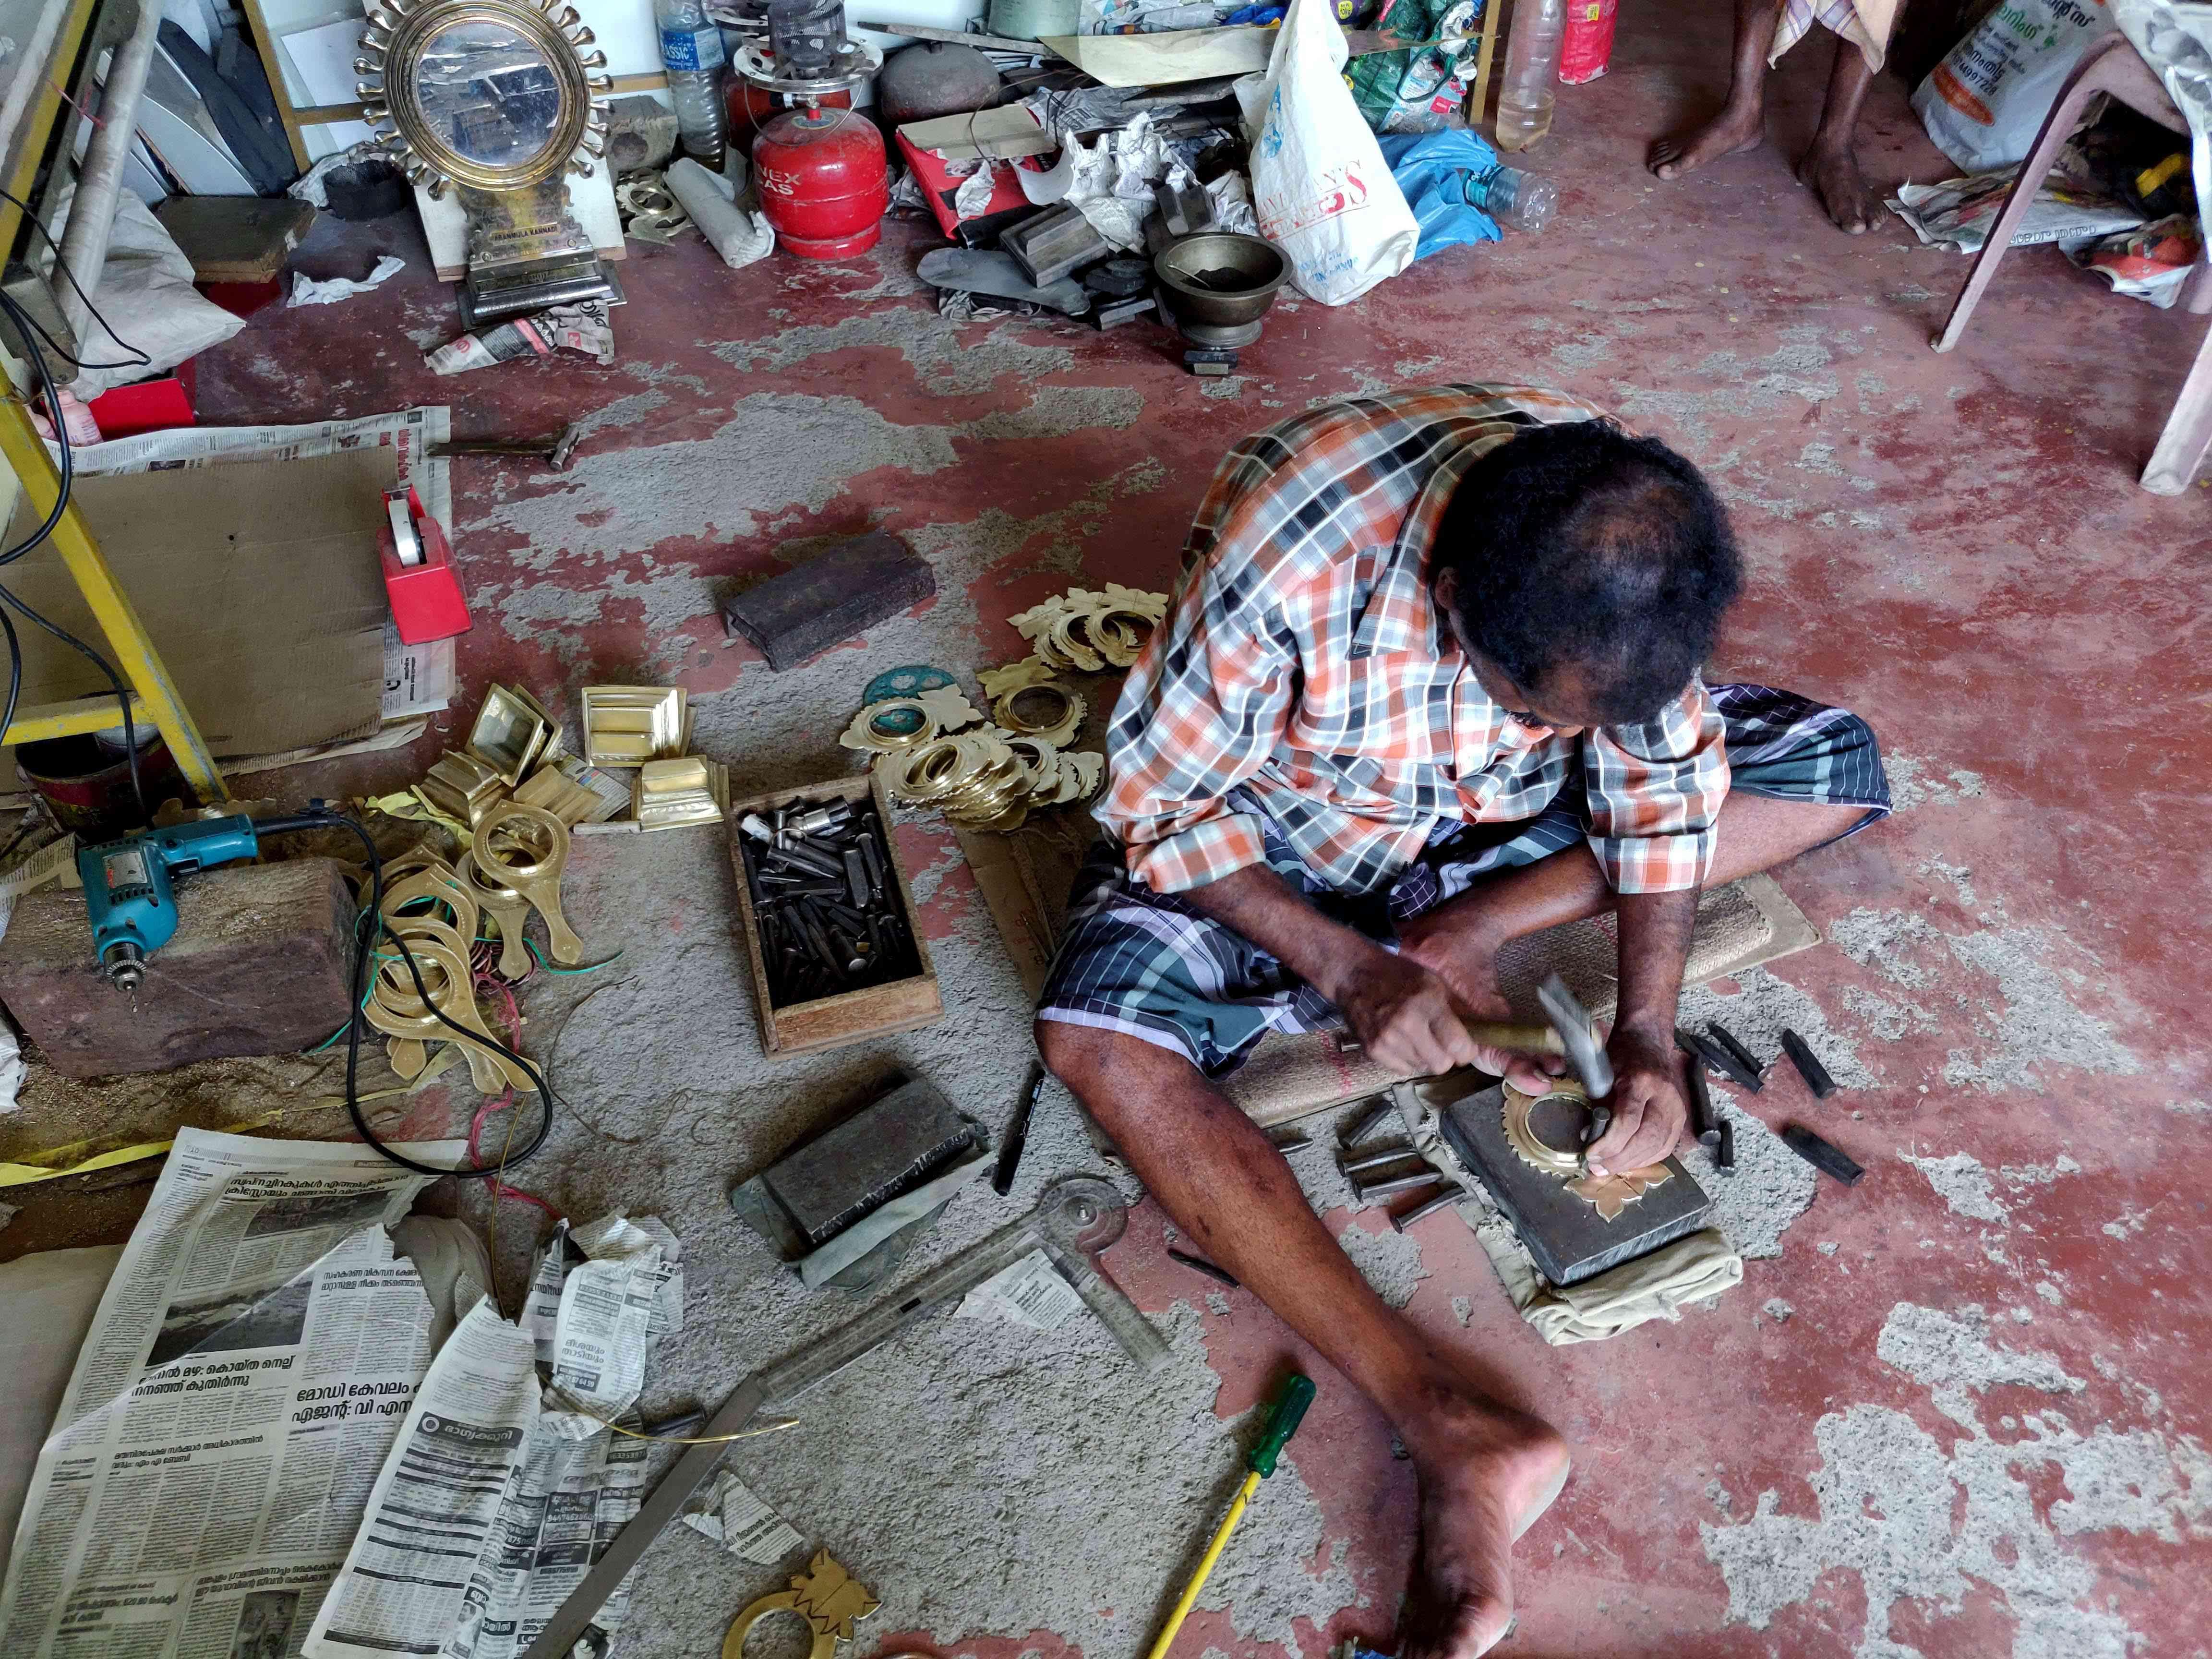 An Aranmula metal mirror workshop in Aranmula. Photo credit: TA Ameerudheen